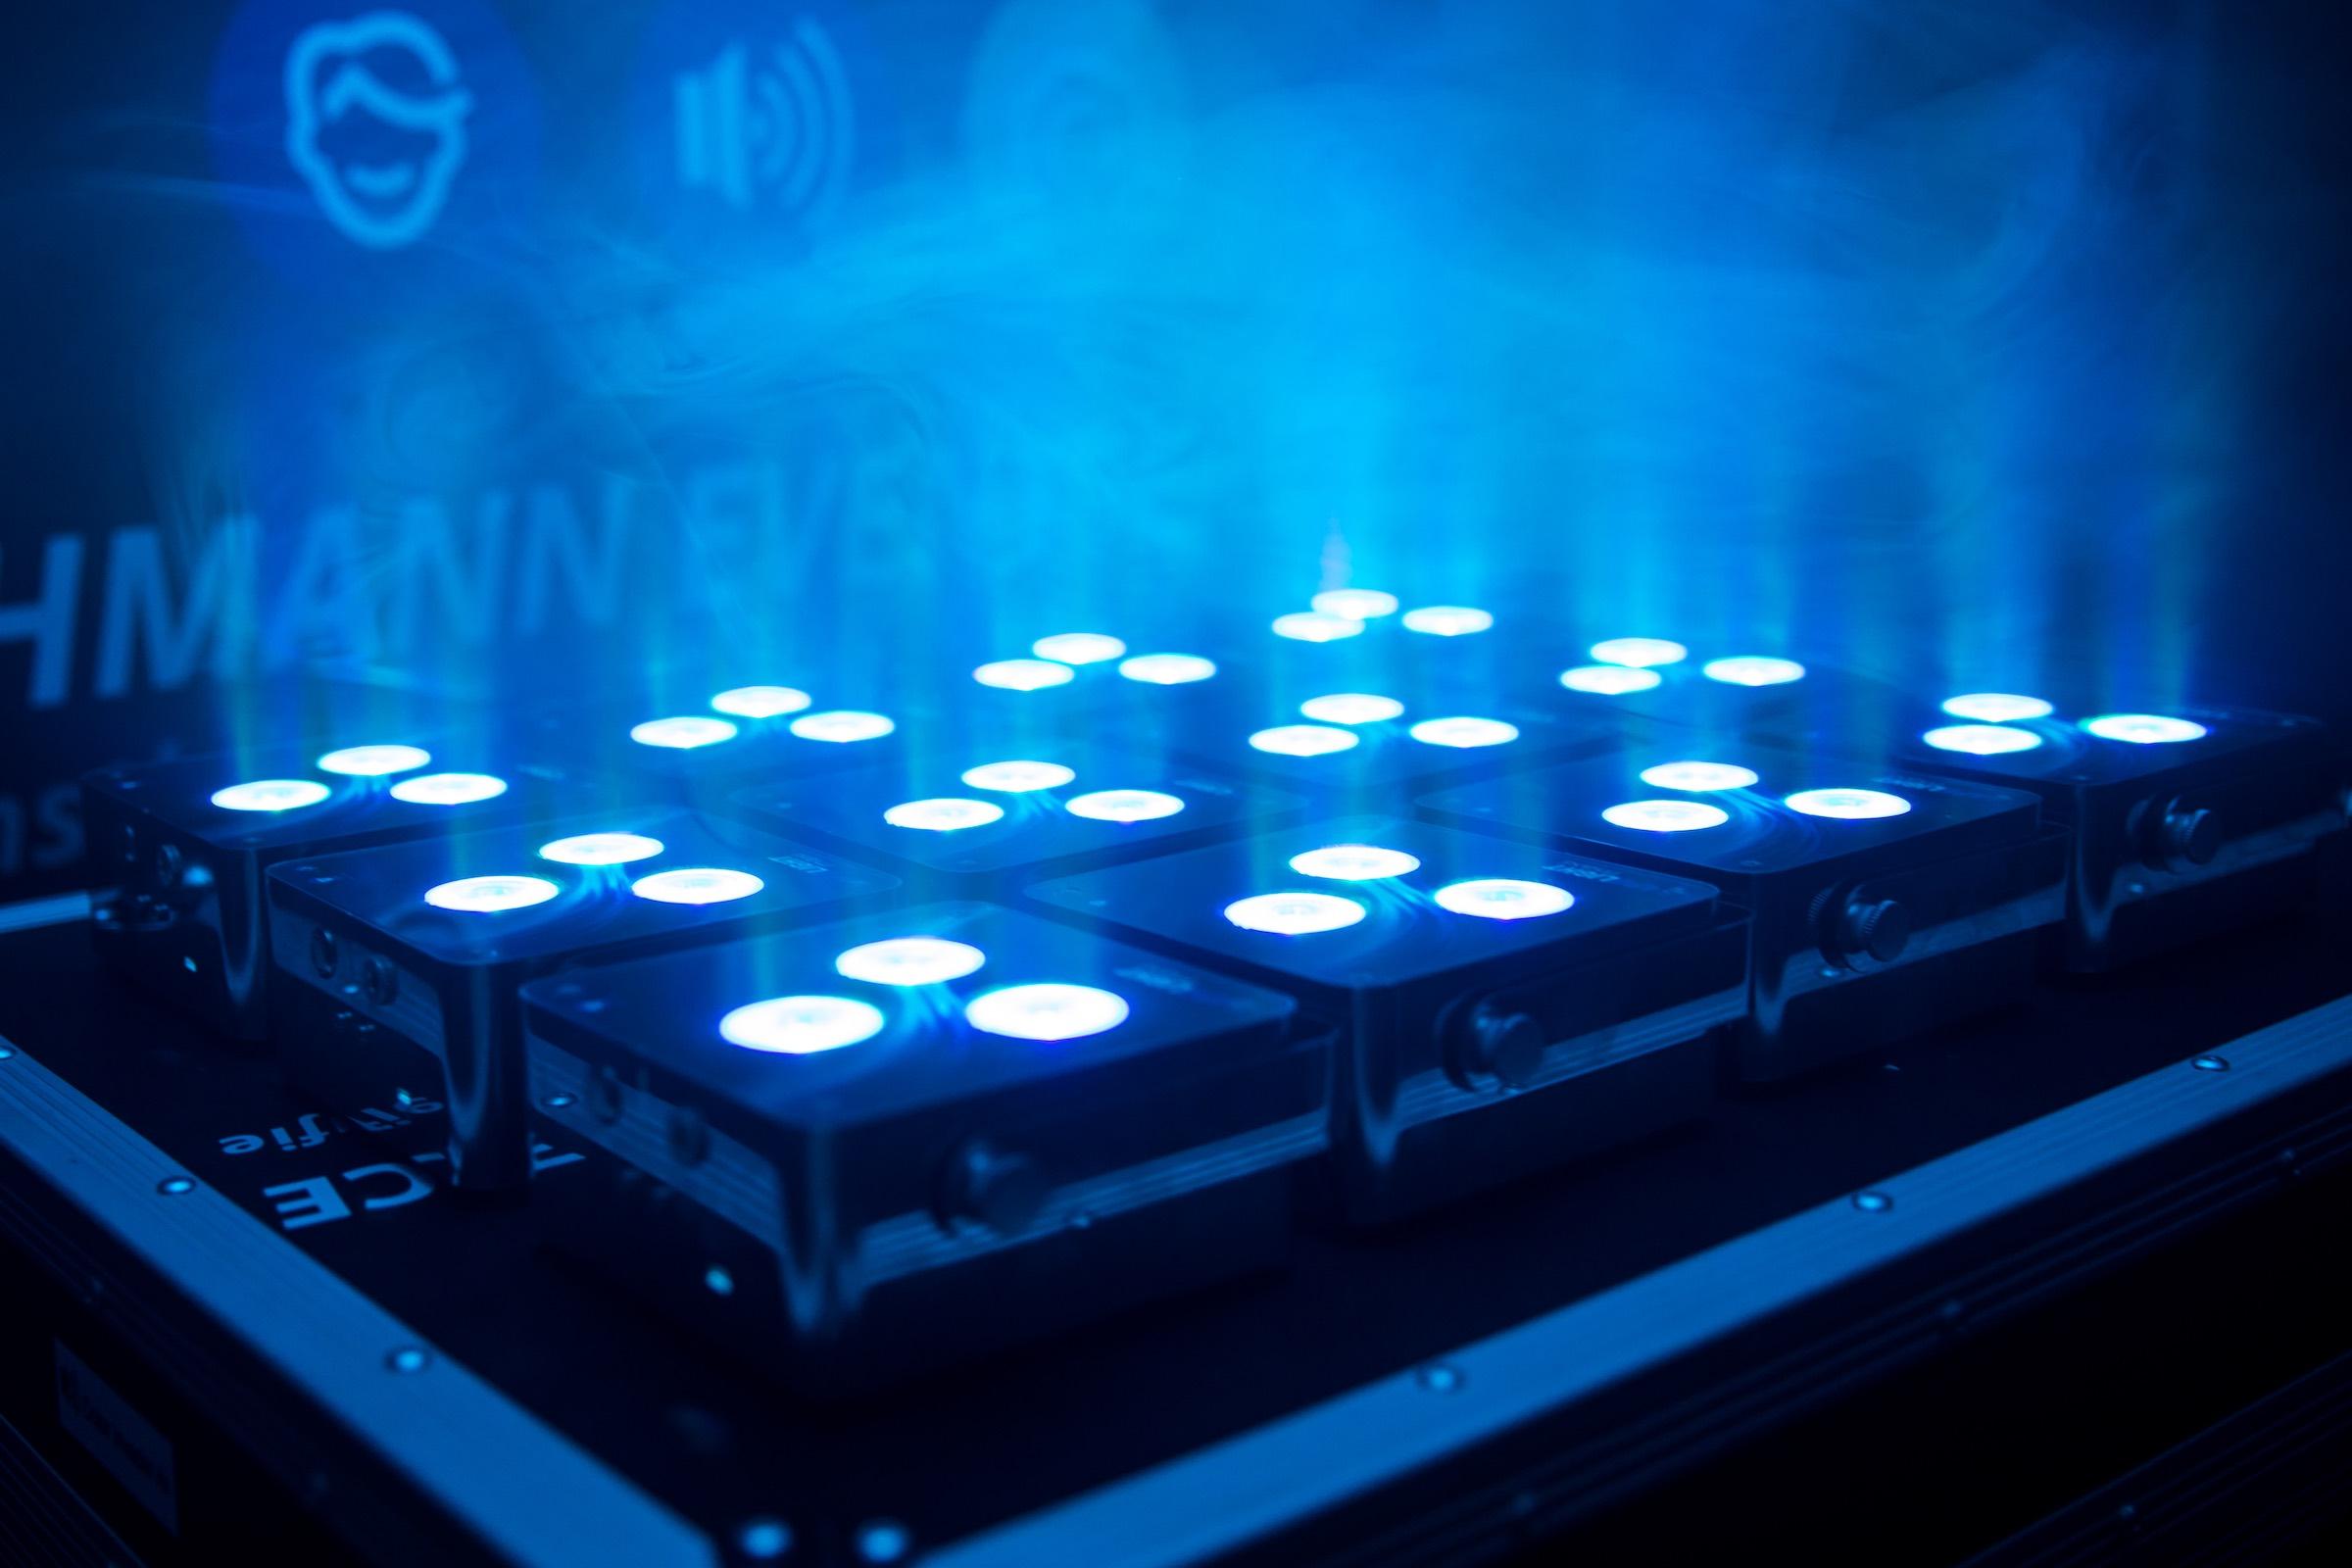 Beleuchtung | Akku | LED | Floorspots | Messe | Firmenveranstaltung | Indoor | Outdoor | Lichttechnik | Ambientebeleuchtung | Uplight | Buchen | Mieten | Anfragen | Lehmann | Eventservice